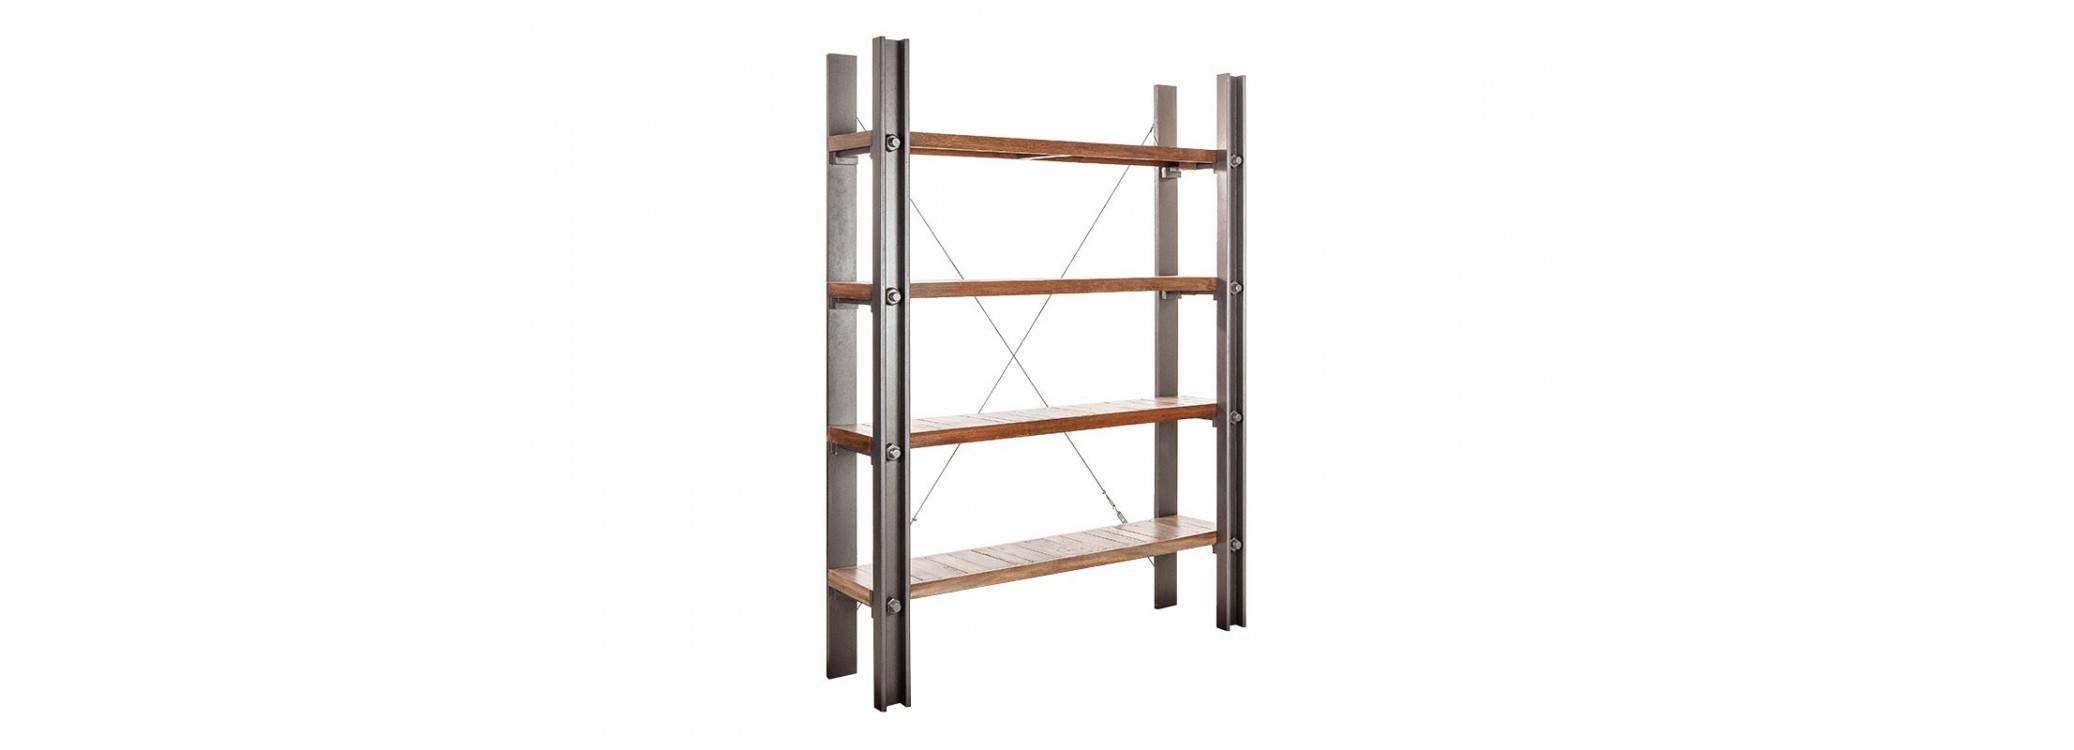 Wide industrial shelf Profile - 4 levels